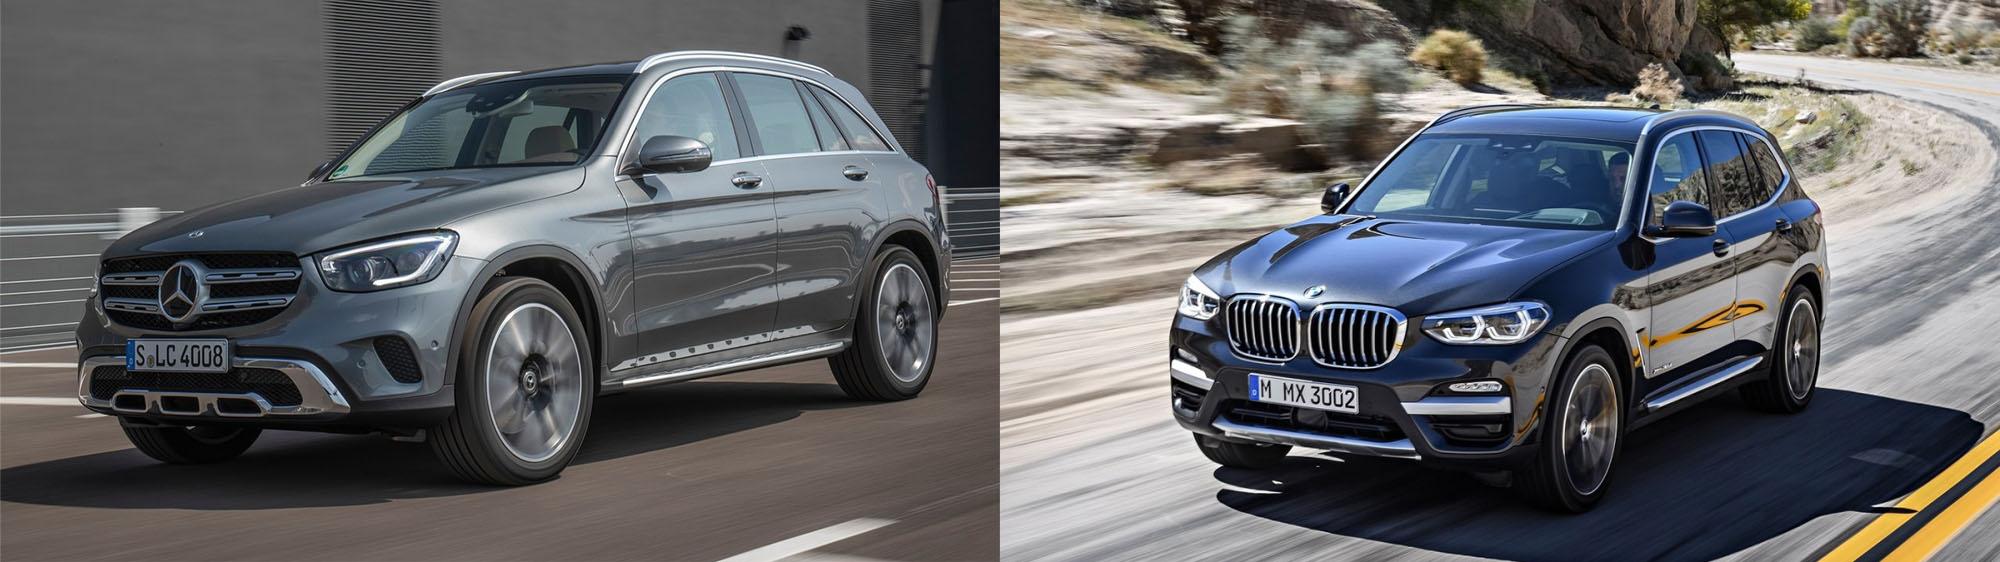 圖/2020 M-Benz GLC 200與2020 BMW X3 xDrive20i之德國血脈SUV比拼。